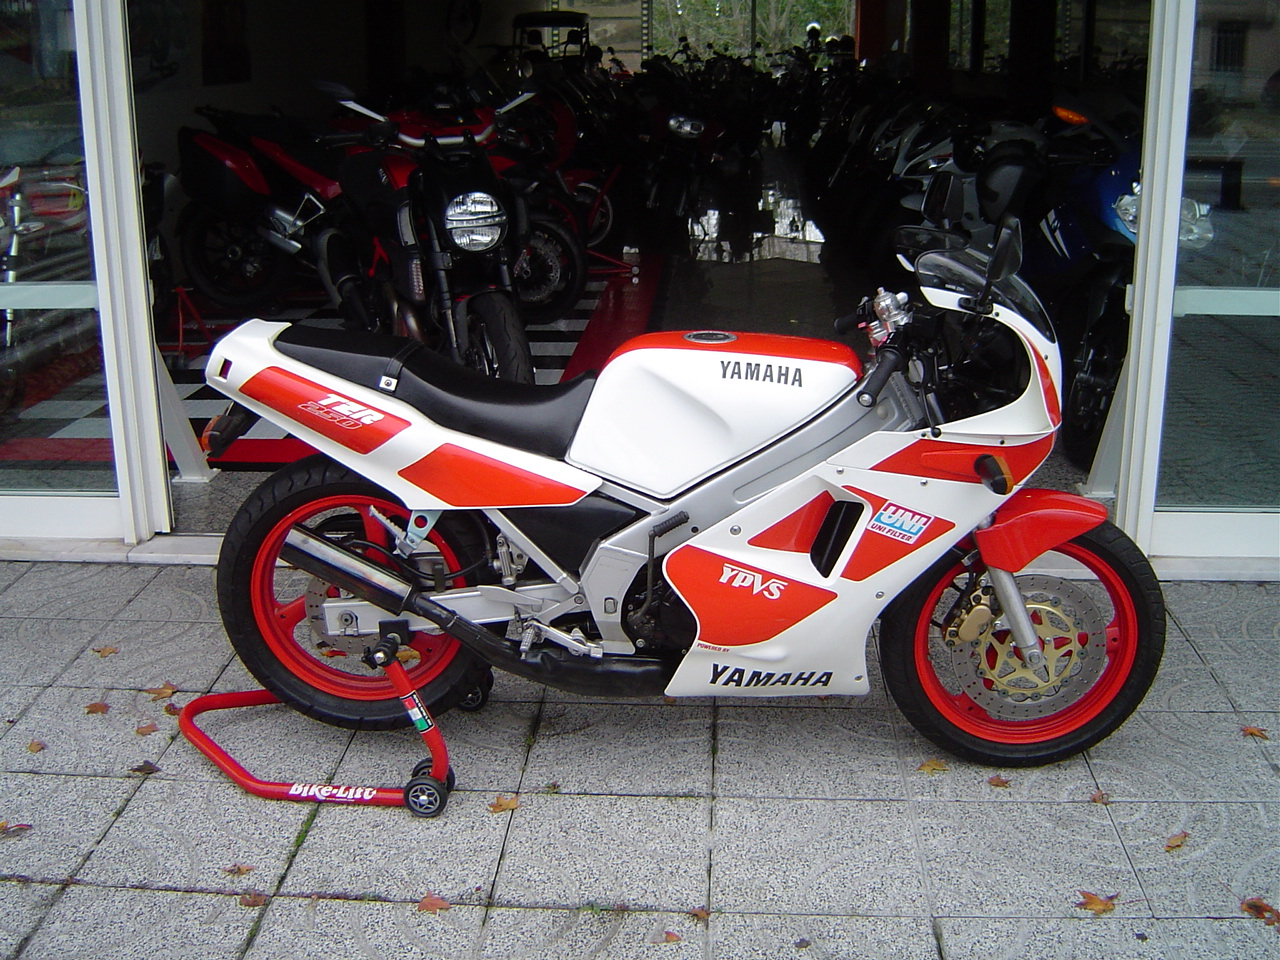 Yamaha TZR 250 R